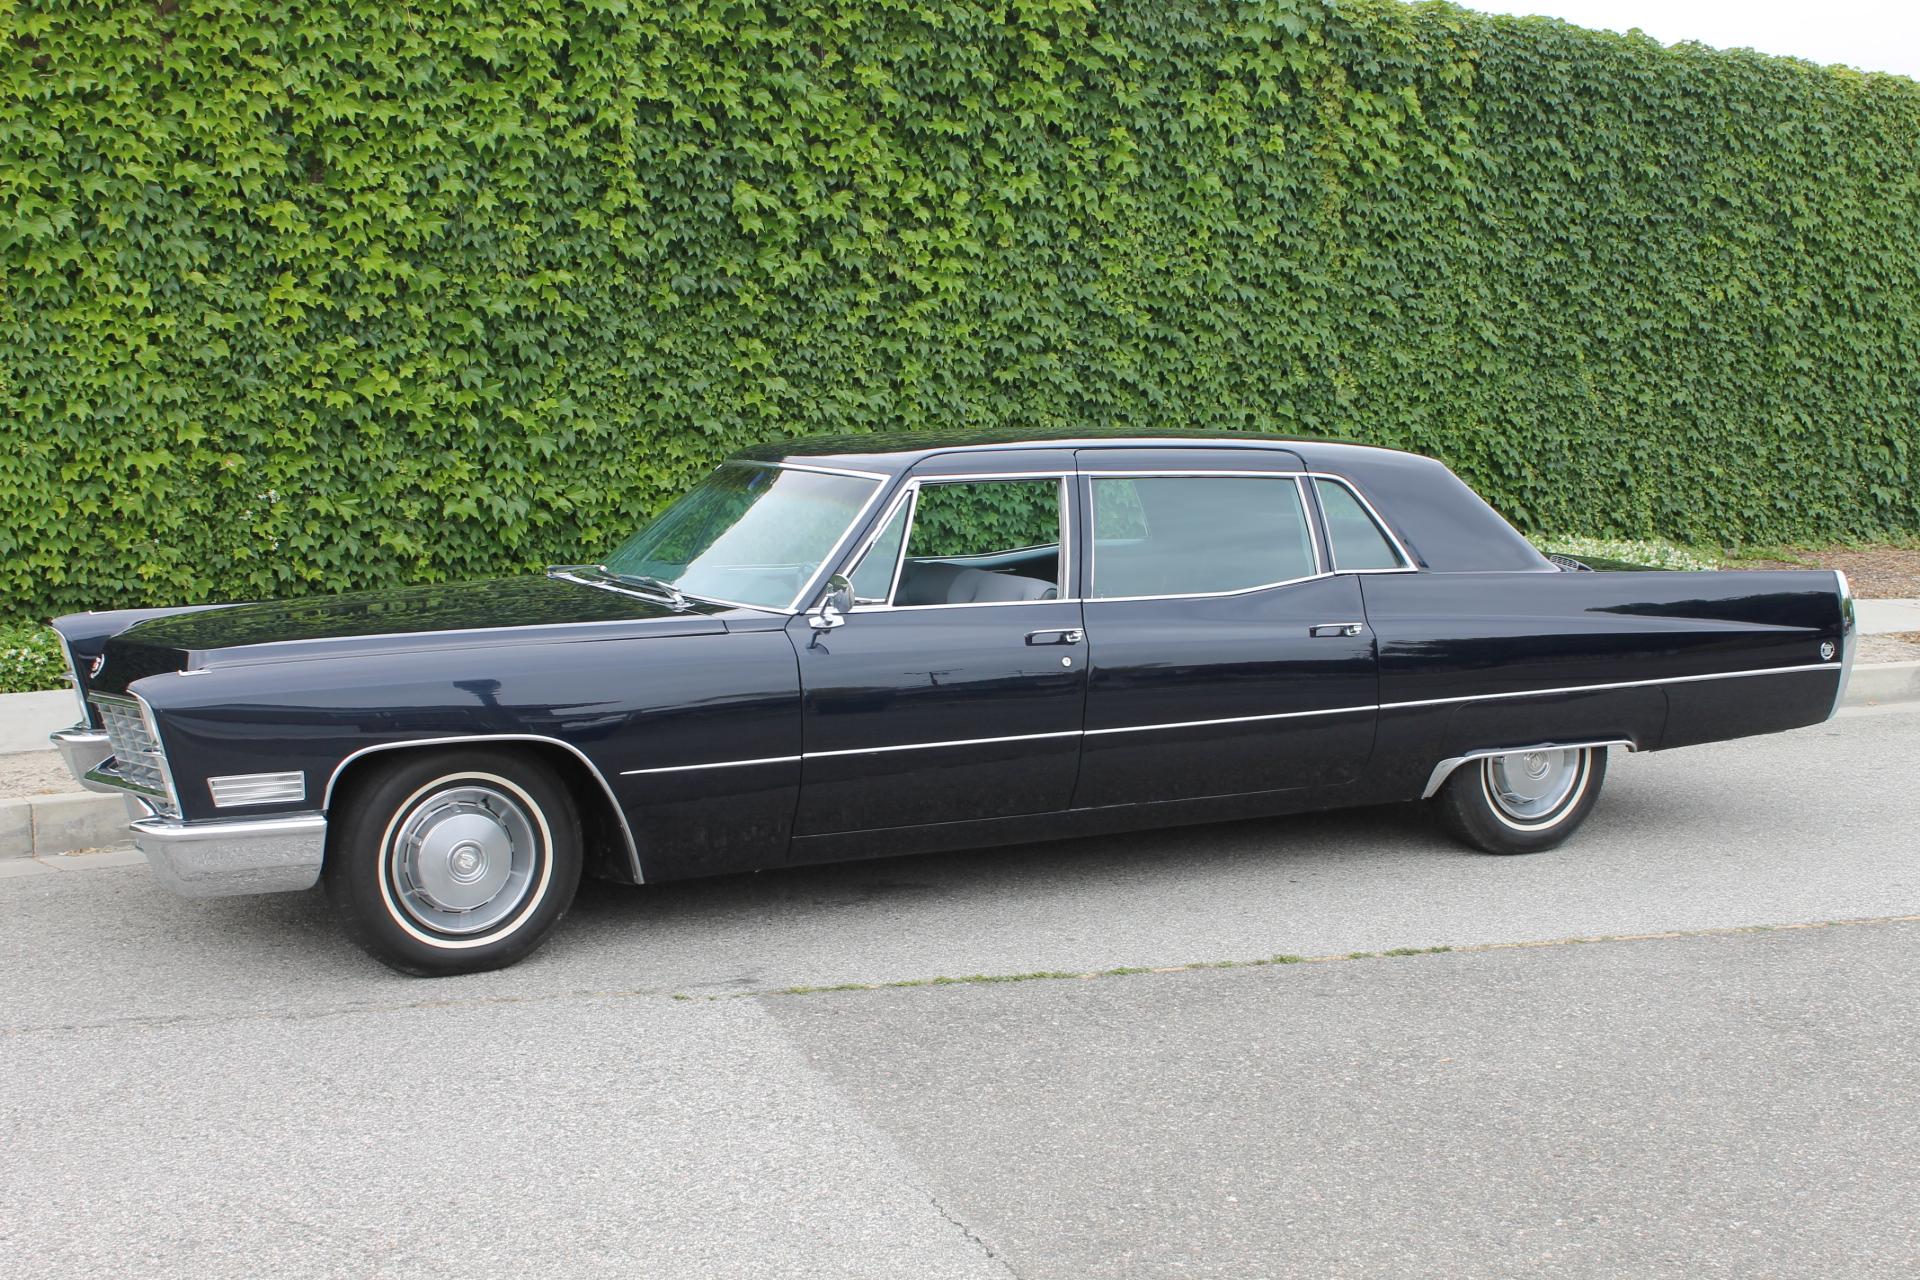 1967 Cadillac The Vault Classic Cars